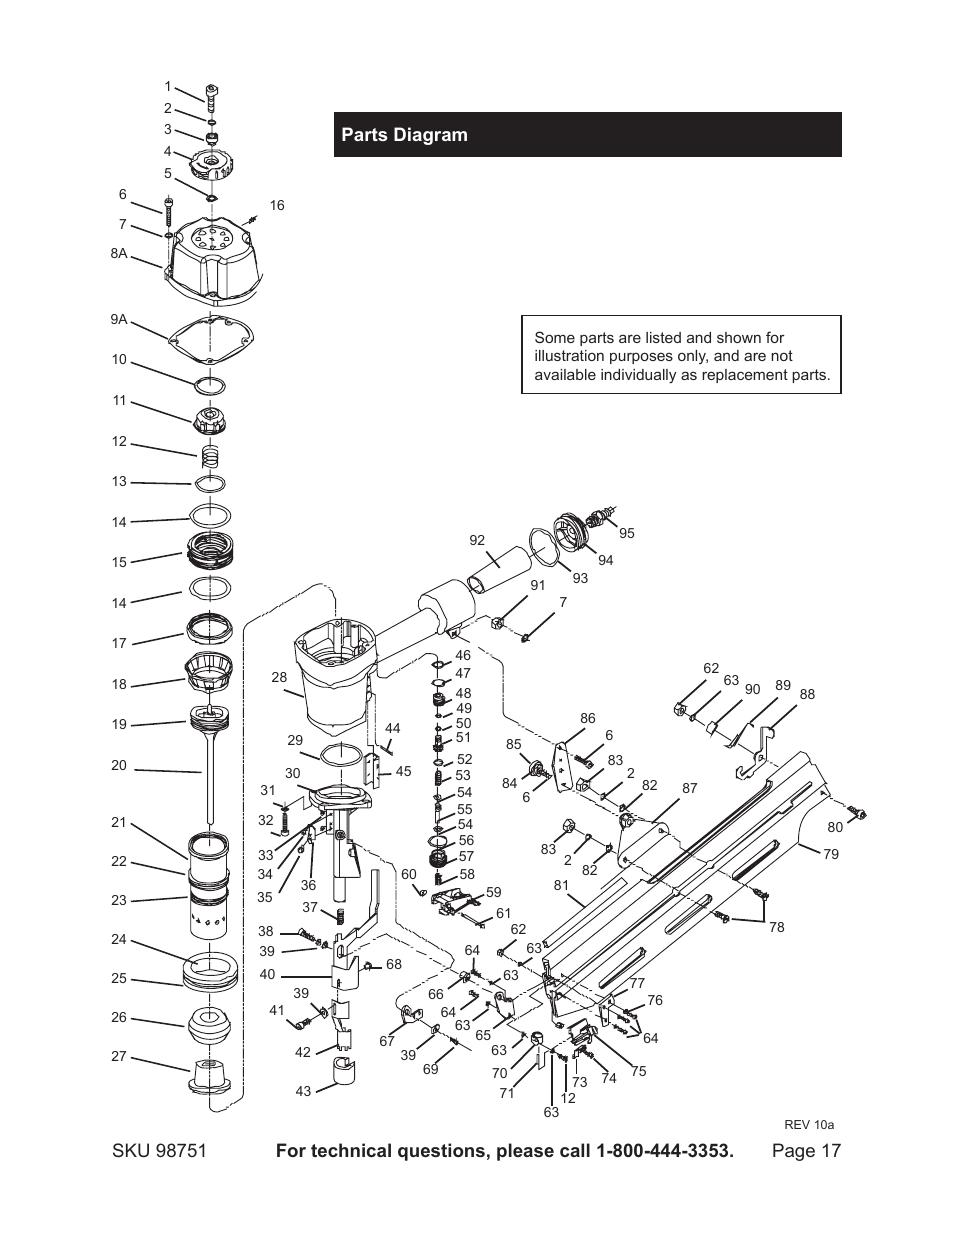 Assembly Diagram  Parts Diagram